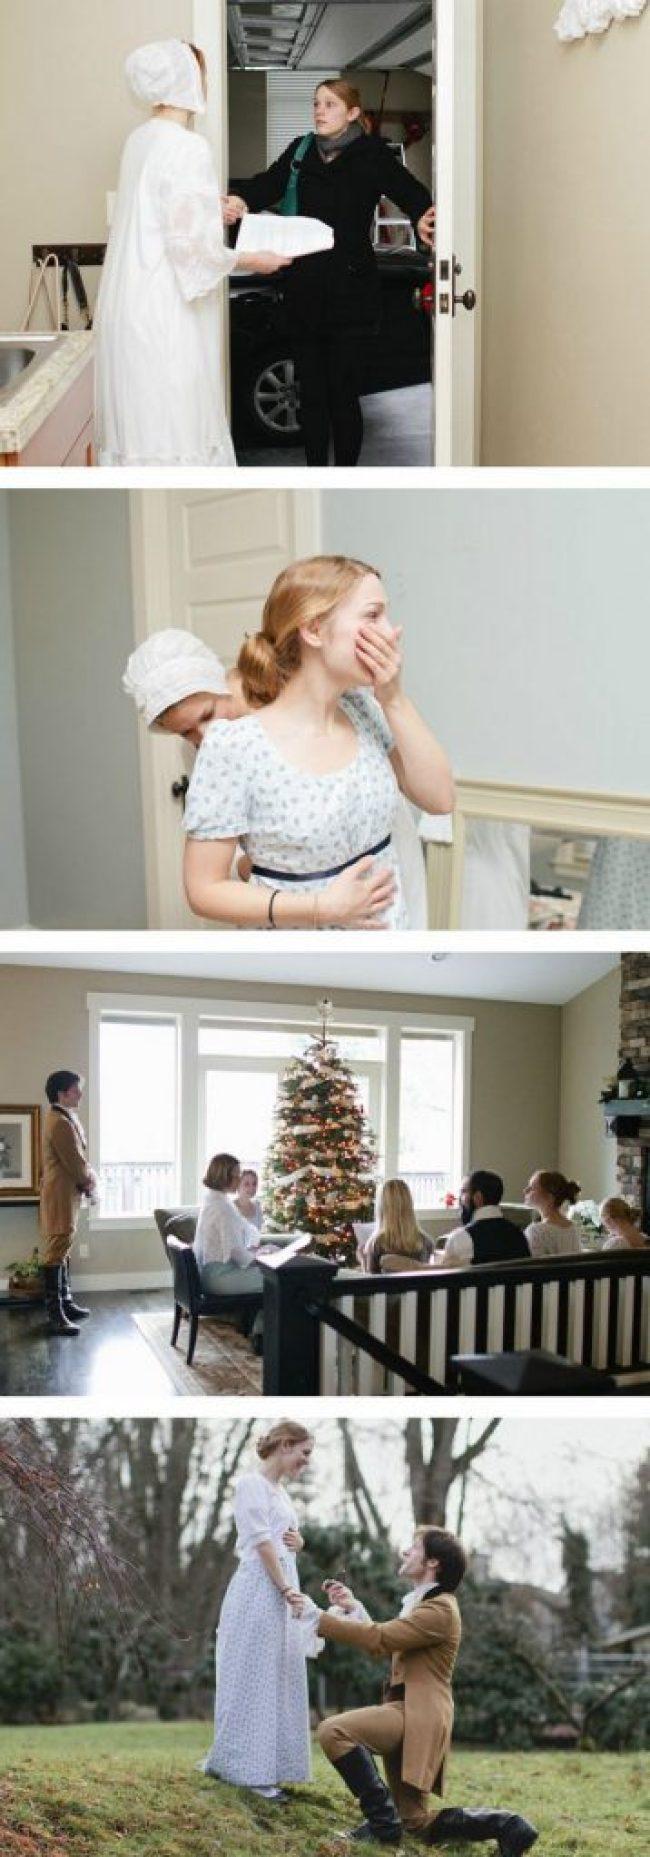 propostas-de-casamento-1